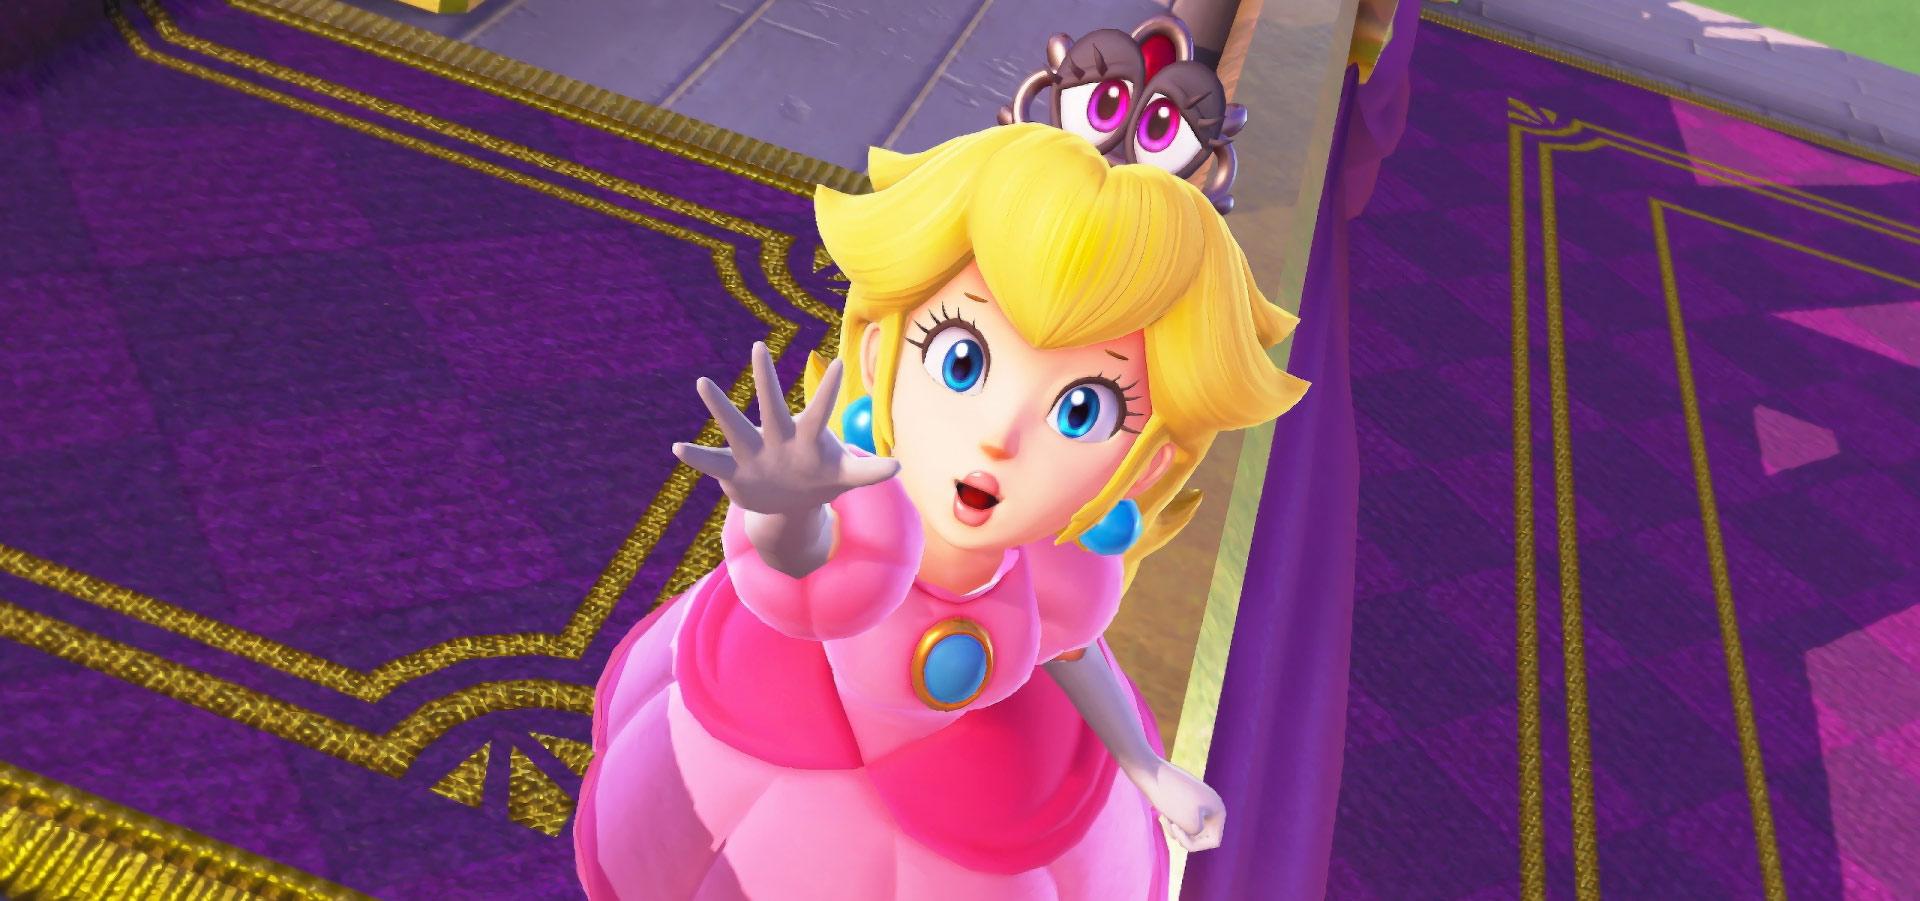 Principessa Peach - SUPER MARIO ODYSSEY